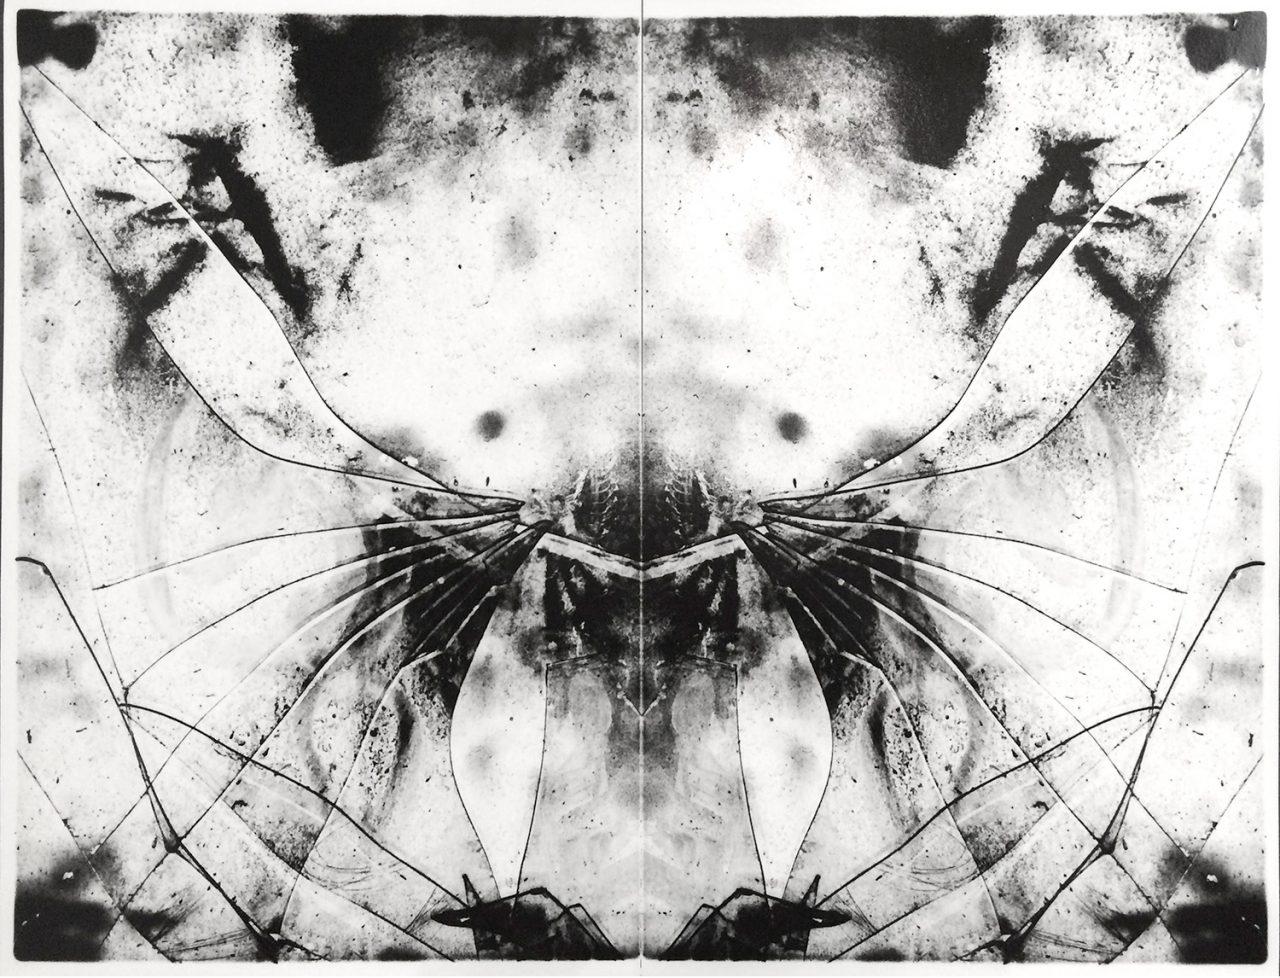 Demonography image